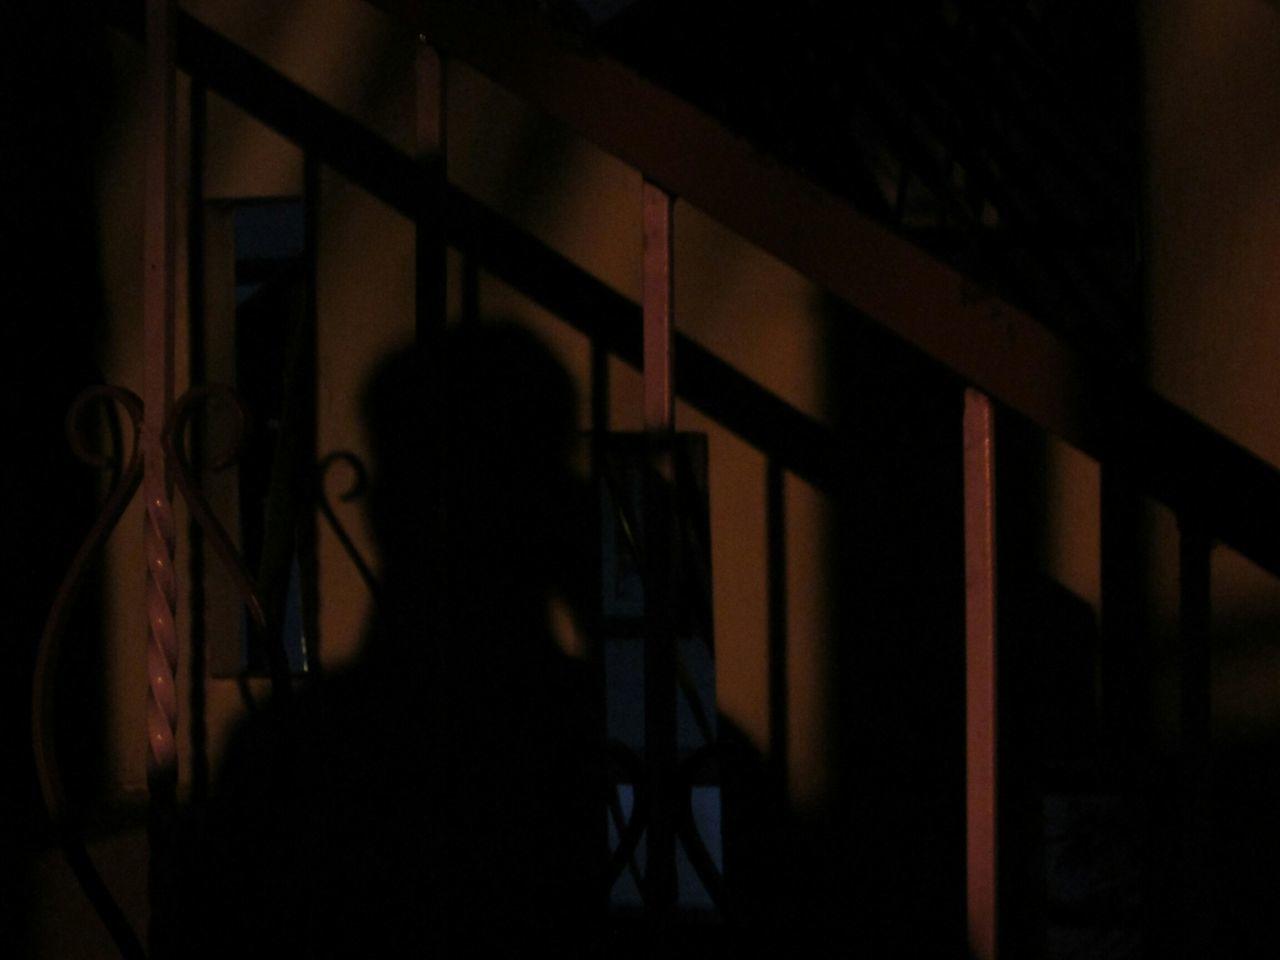 Creative Light And Shadow Me And My Shadow Stairs & Shadows Peace And Quiet Light And Shadow My Shadow ShadowSelfie